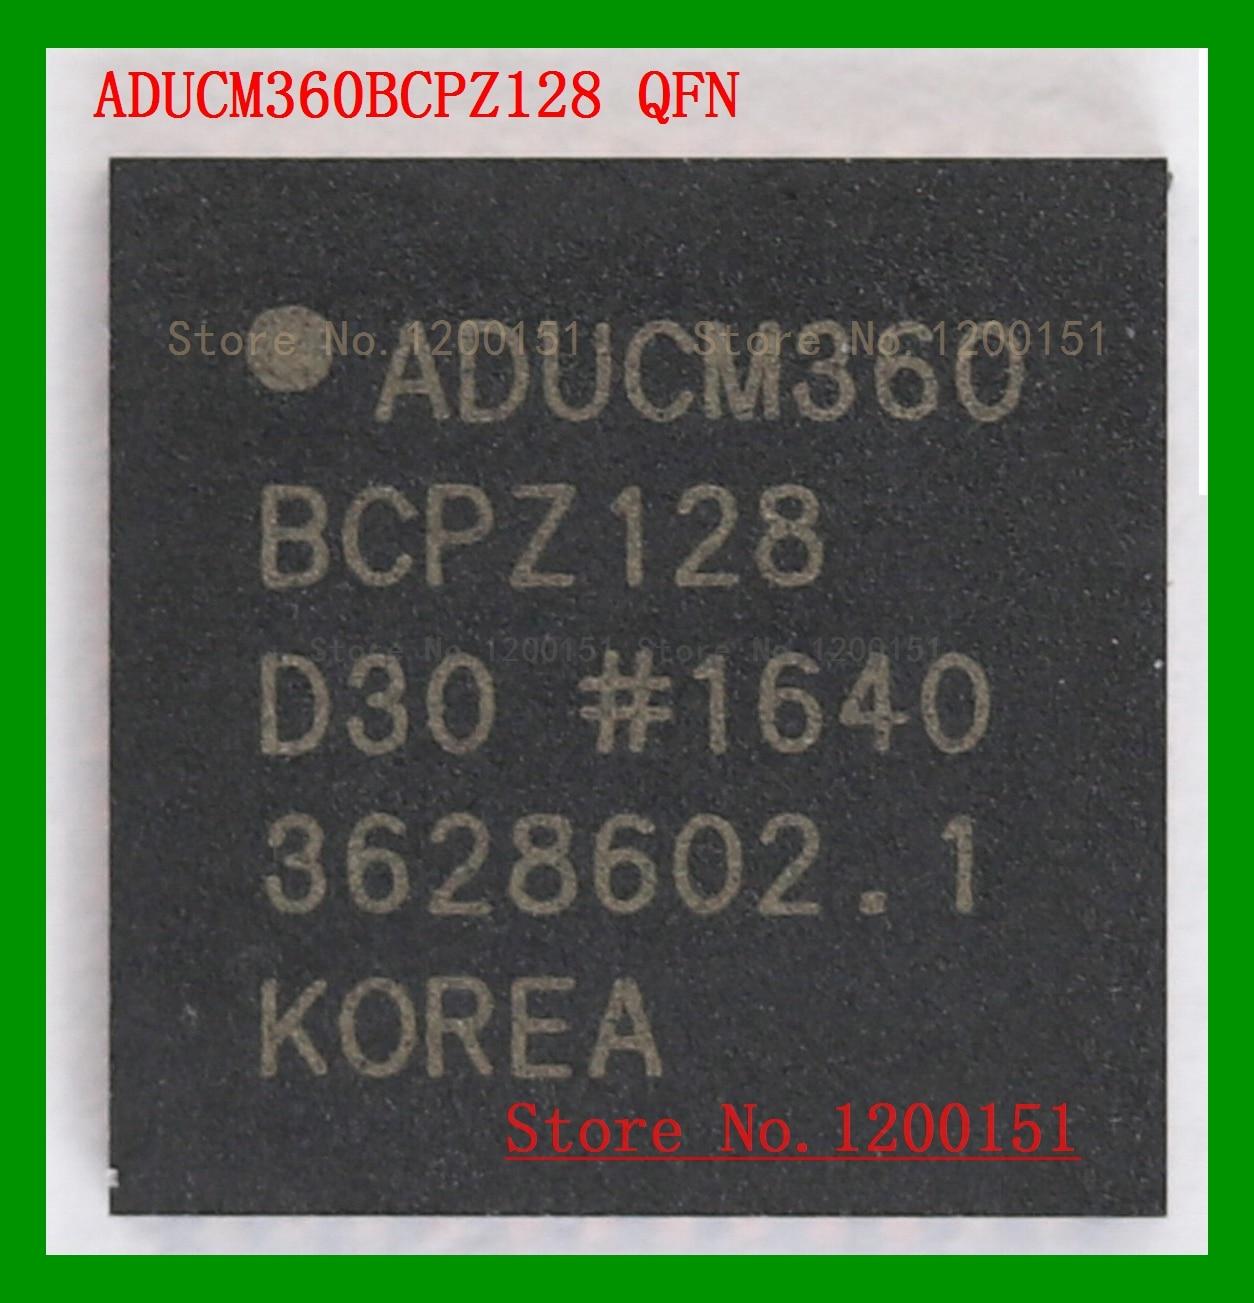 ADUCM360 ADUCM360BCPZ128 QFNADUCM360 ADUCM360BCPZ128 QFN